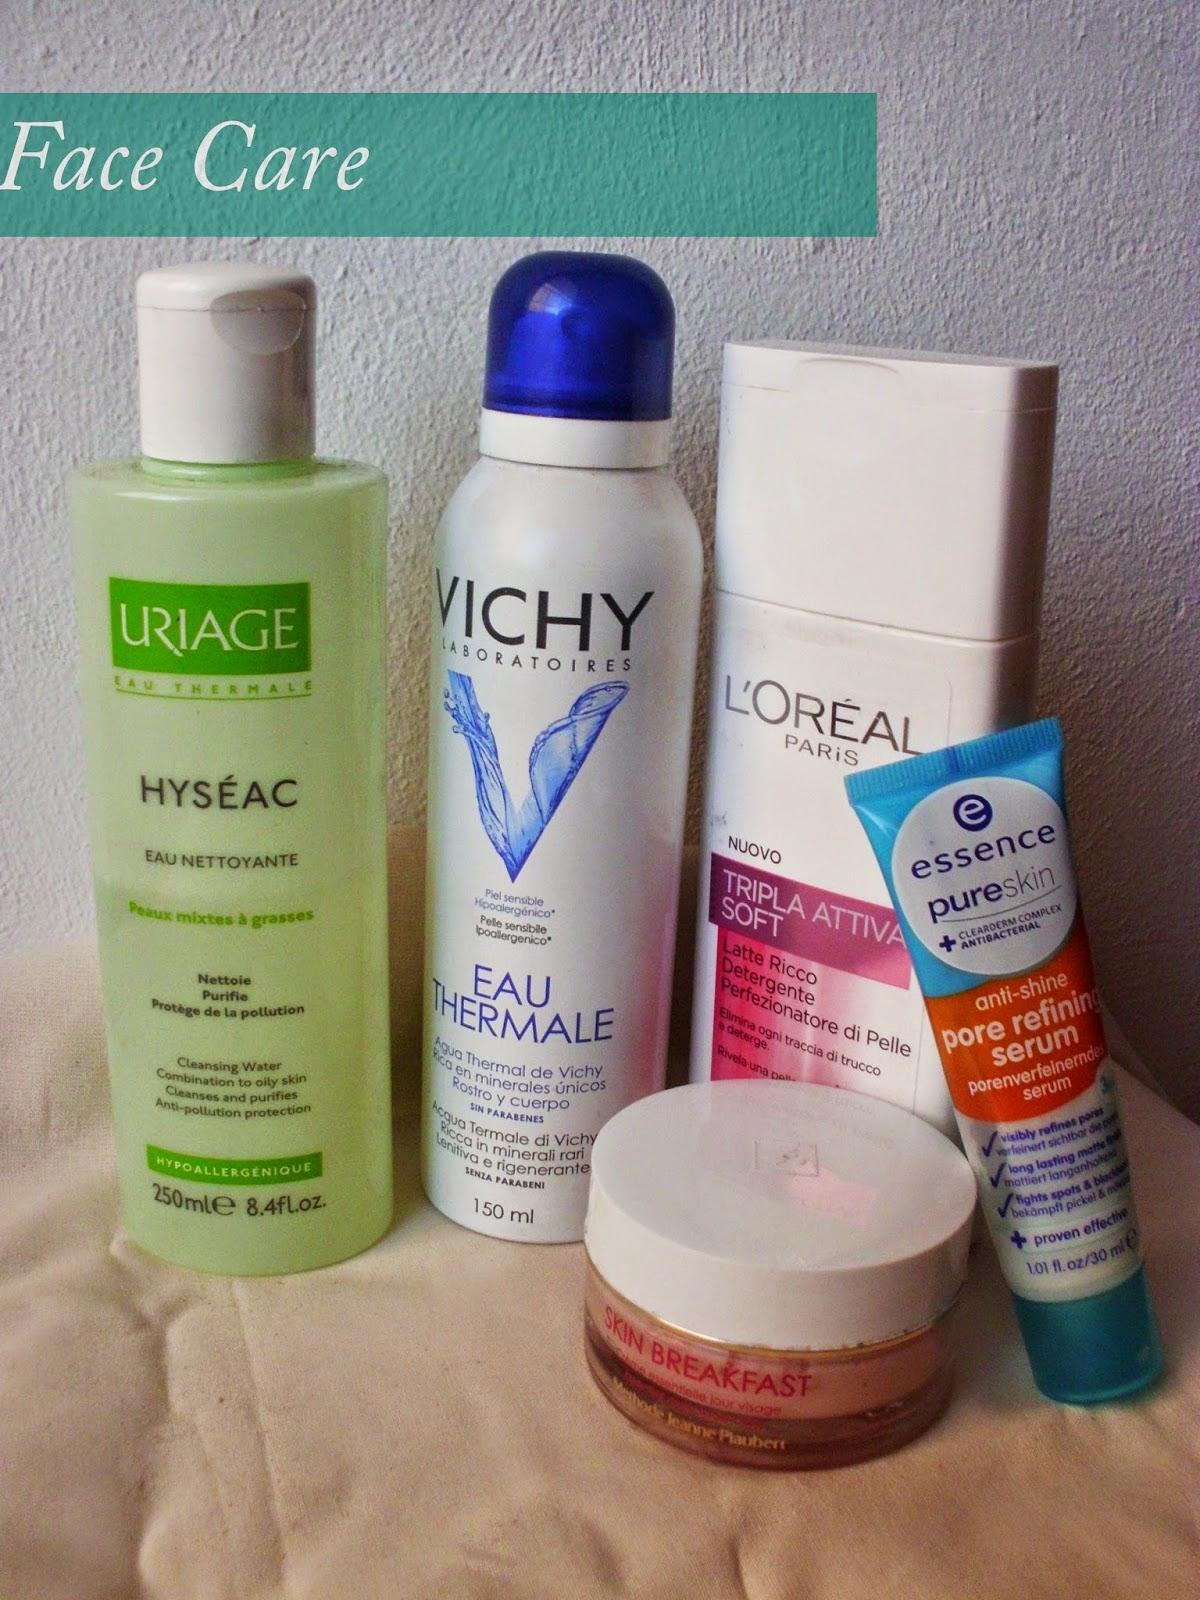 Skincare, Uriage Hyséac Eau Nettoyante, Vichy Eau Thermale, L'Oréal Paris Tripla Attiva Soft Latte Ricco Detergente, Essence Pure Skin Anti-Shine Pore Refine Serum